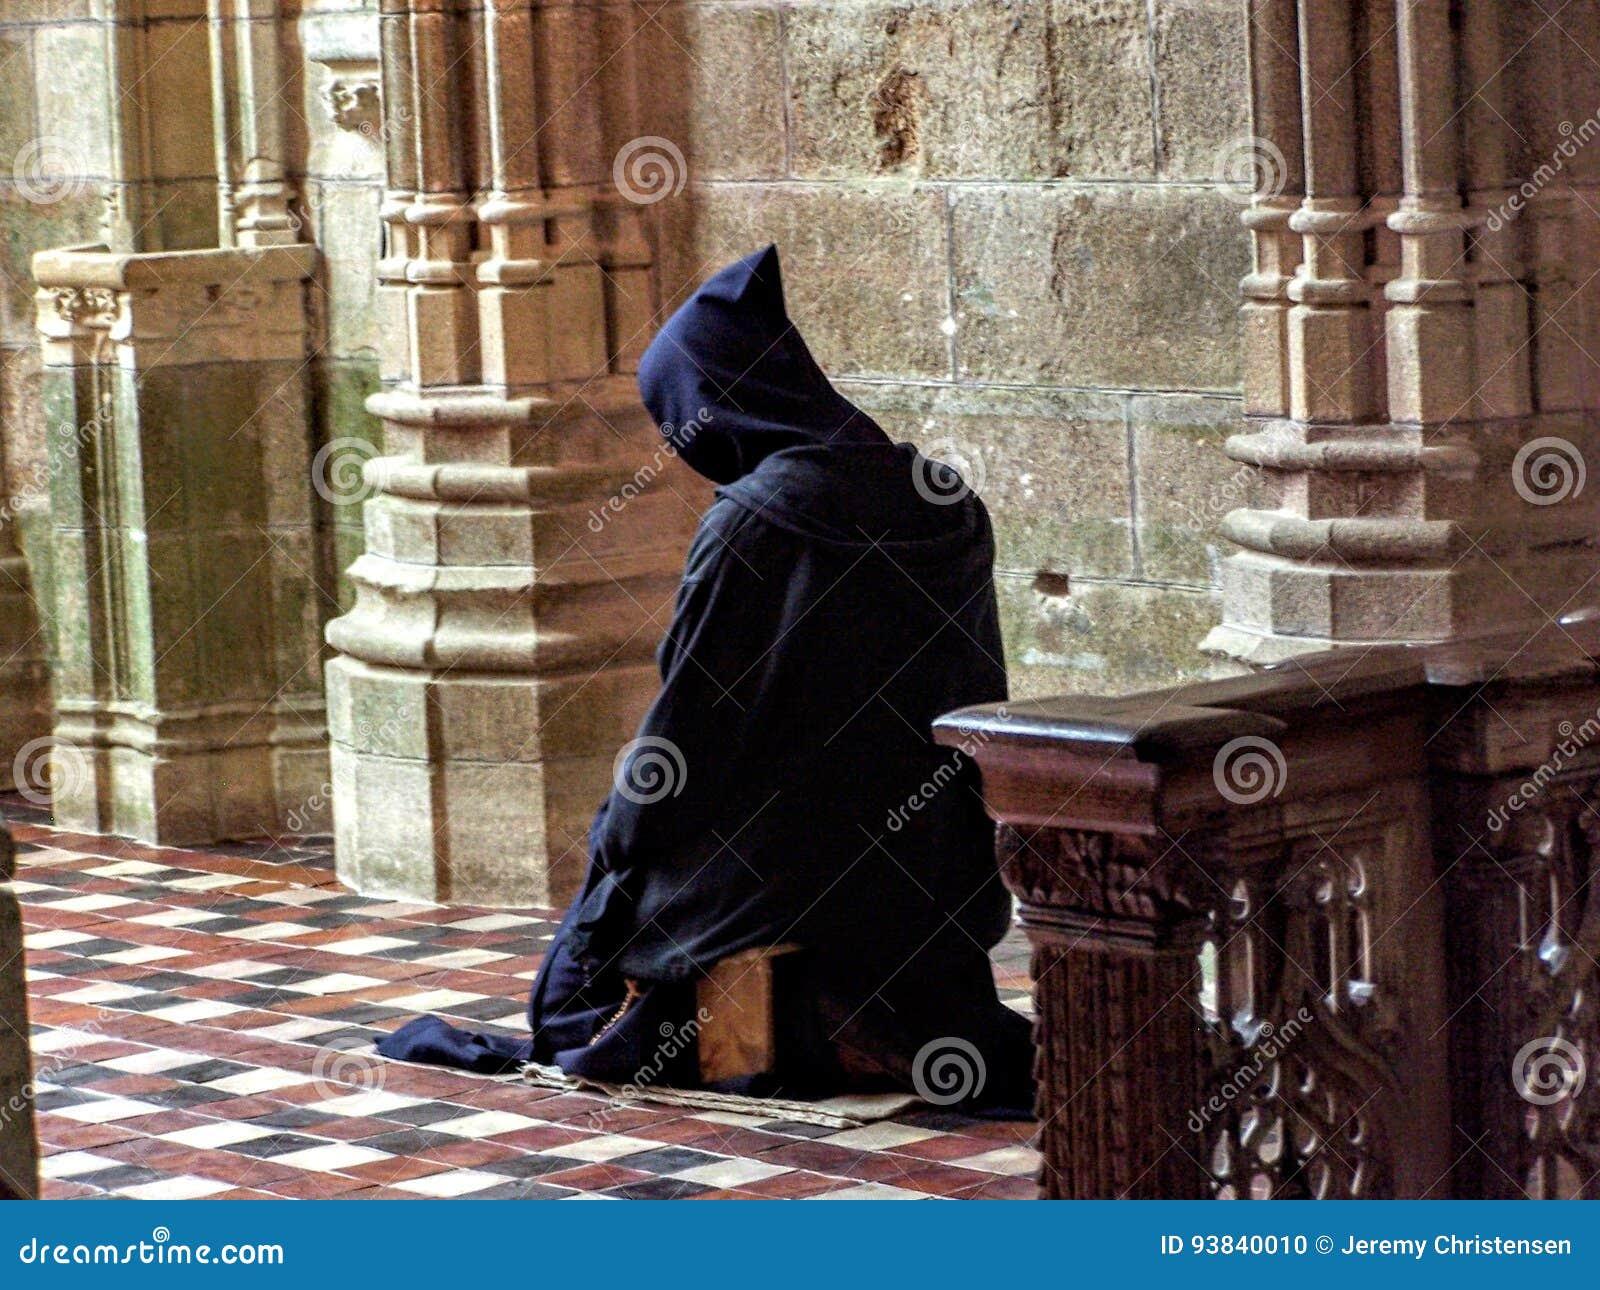 Catholic Christian Monk kneeling in humble prayer asking God for help